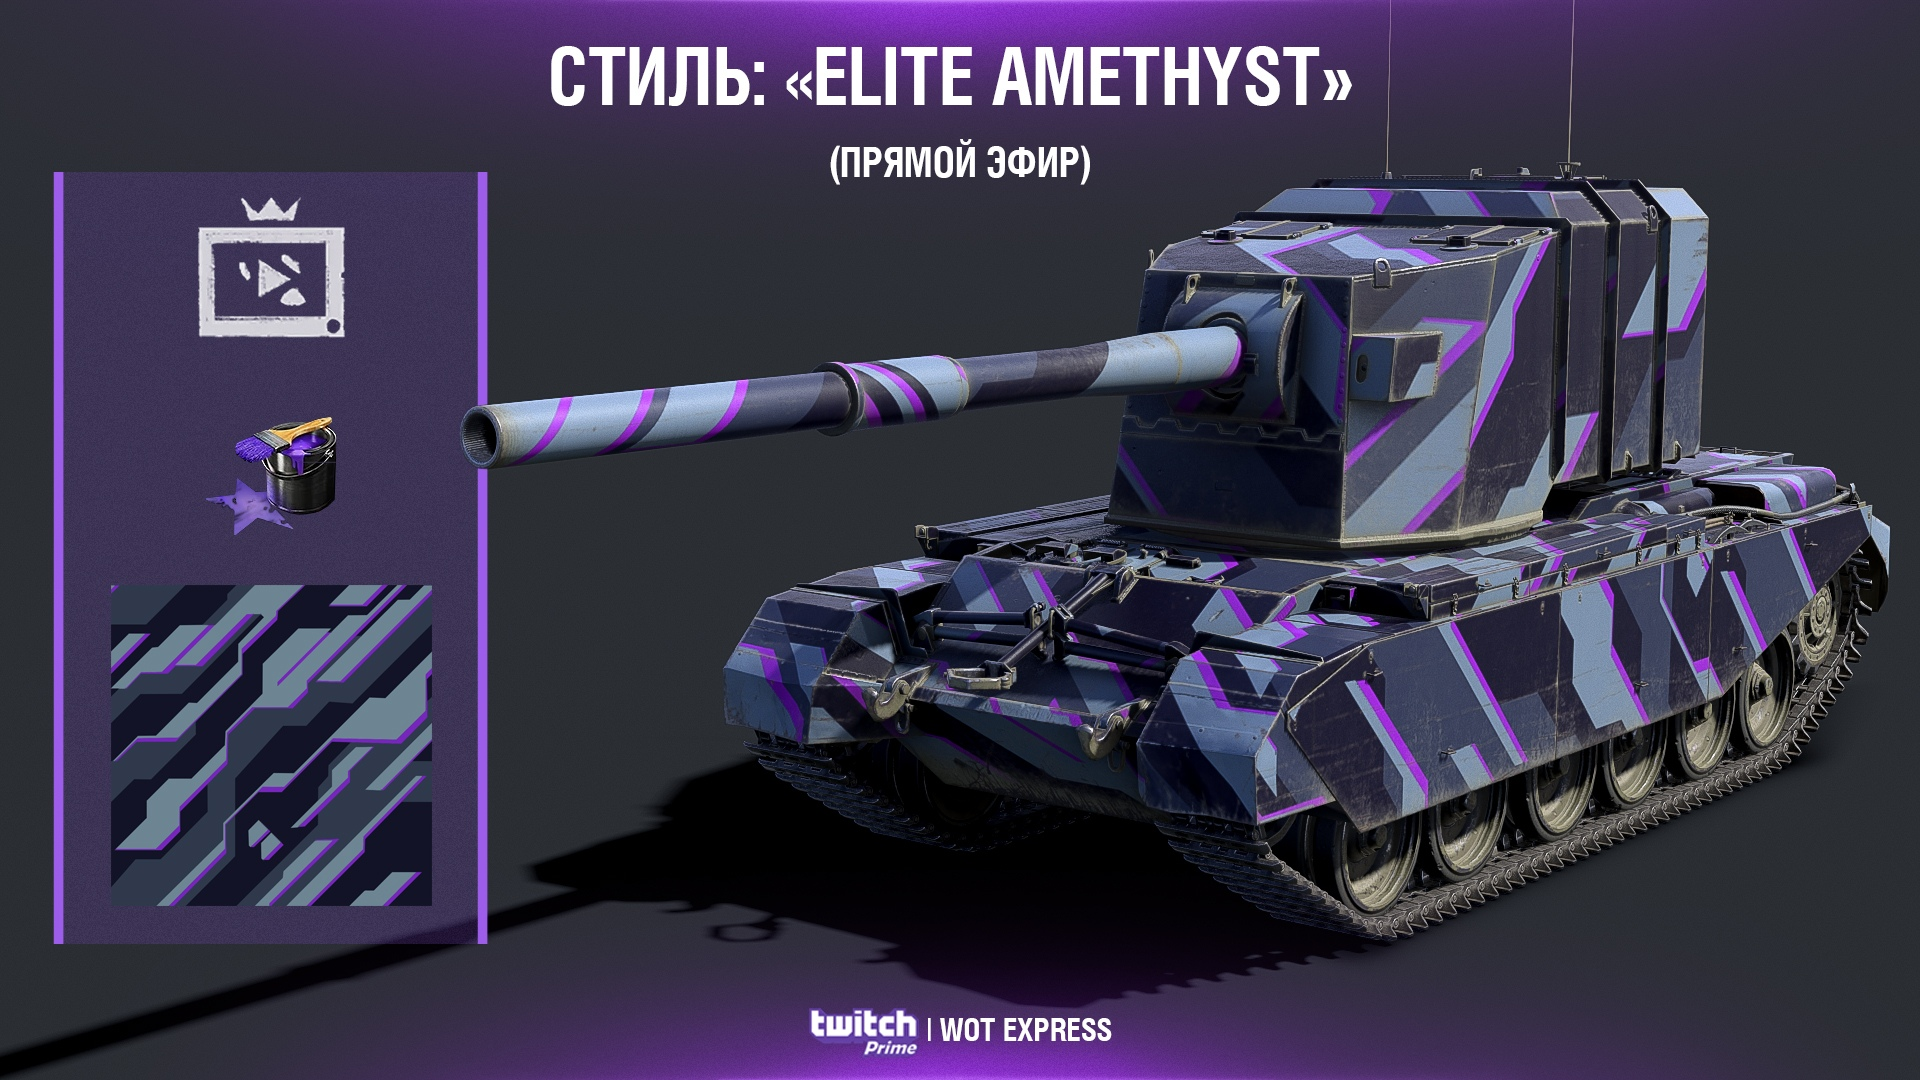 World of Tanks - Care Package Bravo (no Prime) 2019